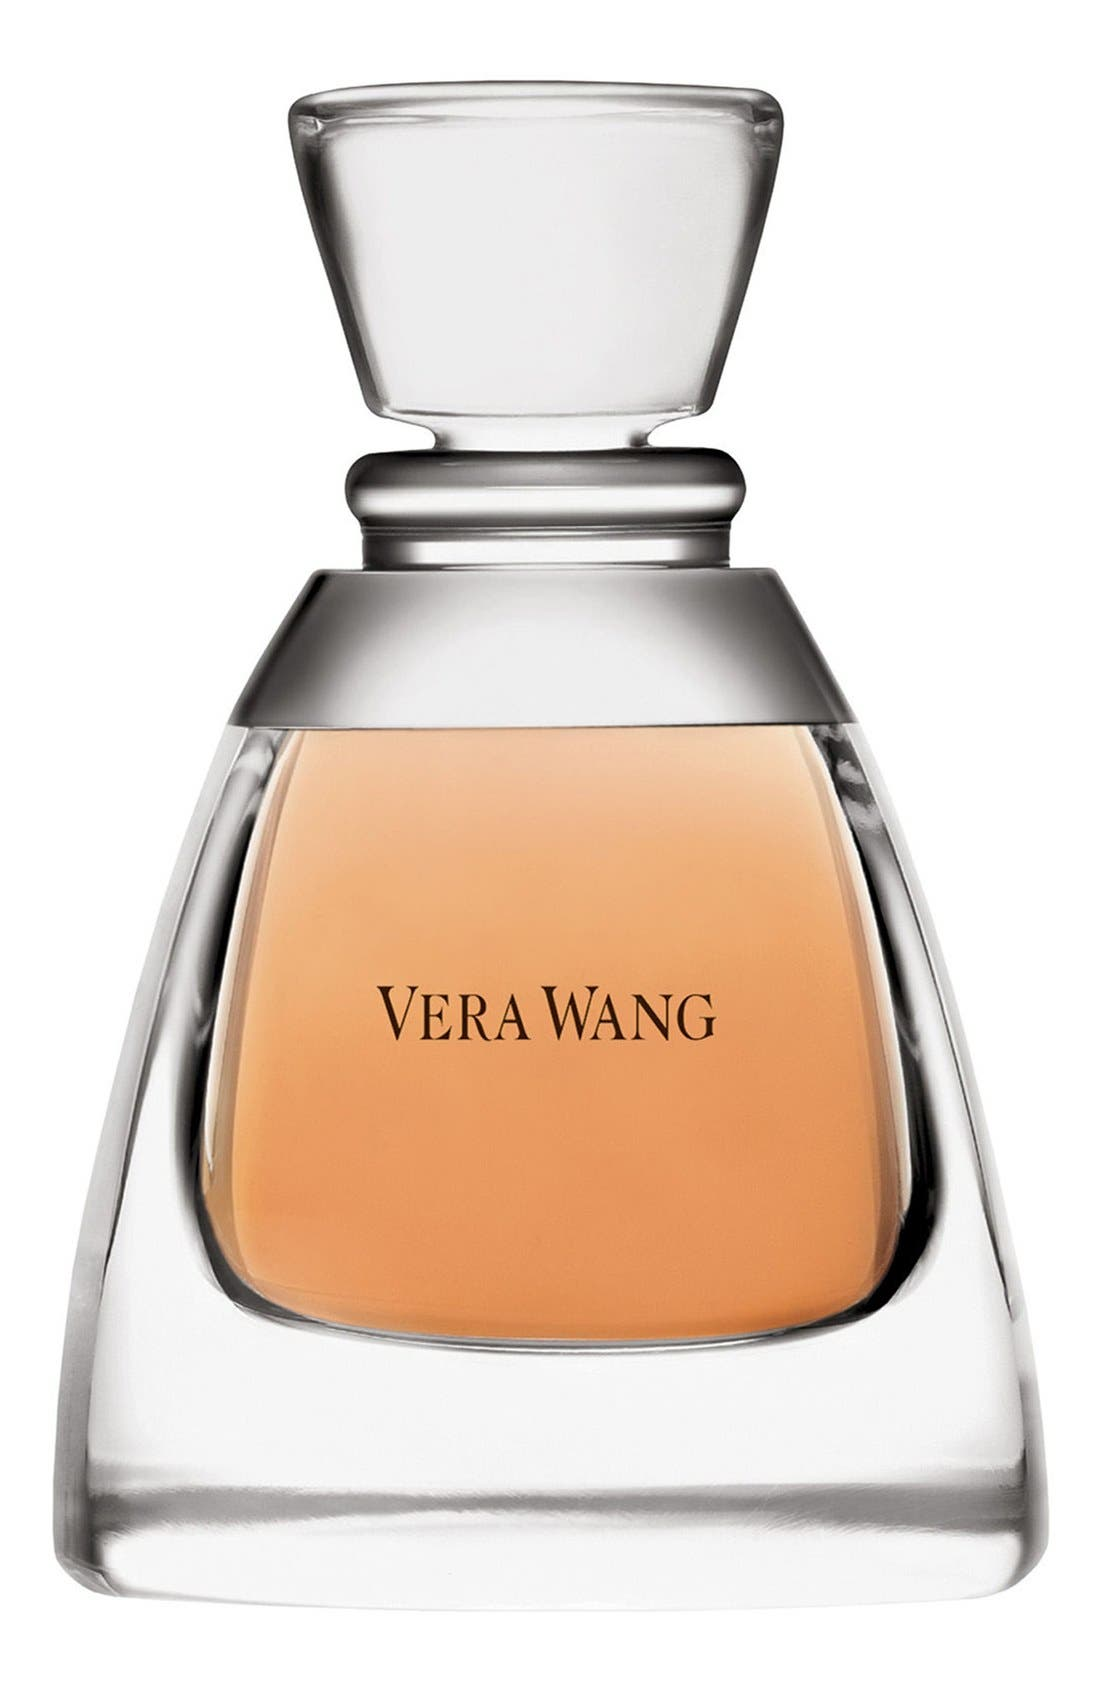 VERA WANG, Eau de Parfum Spray, Main thumbnail 1, color, 000